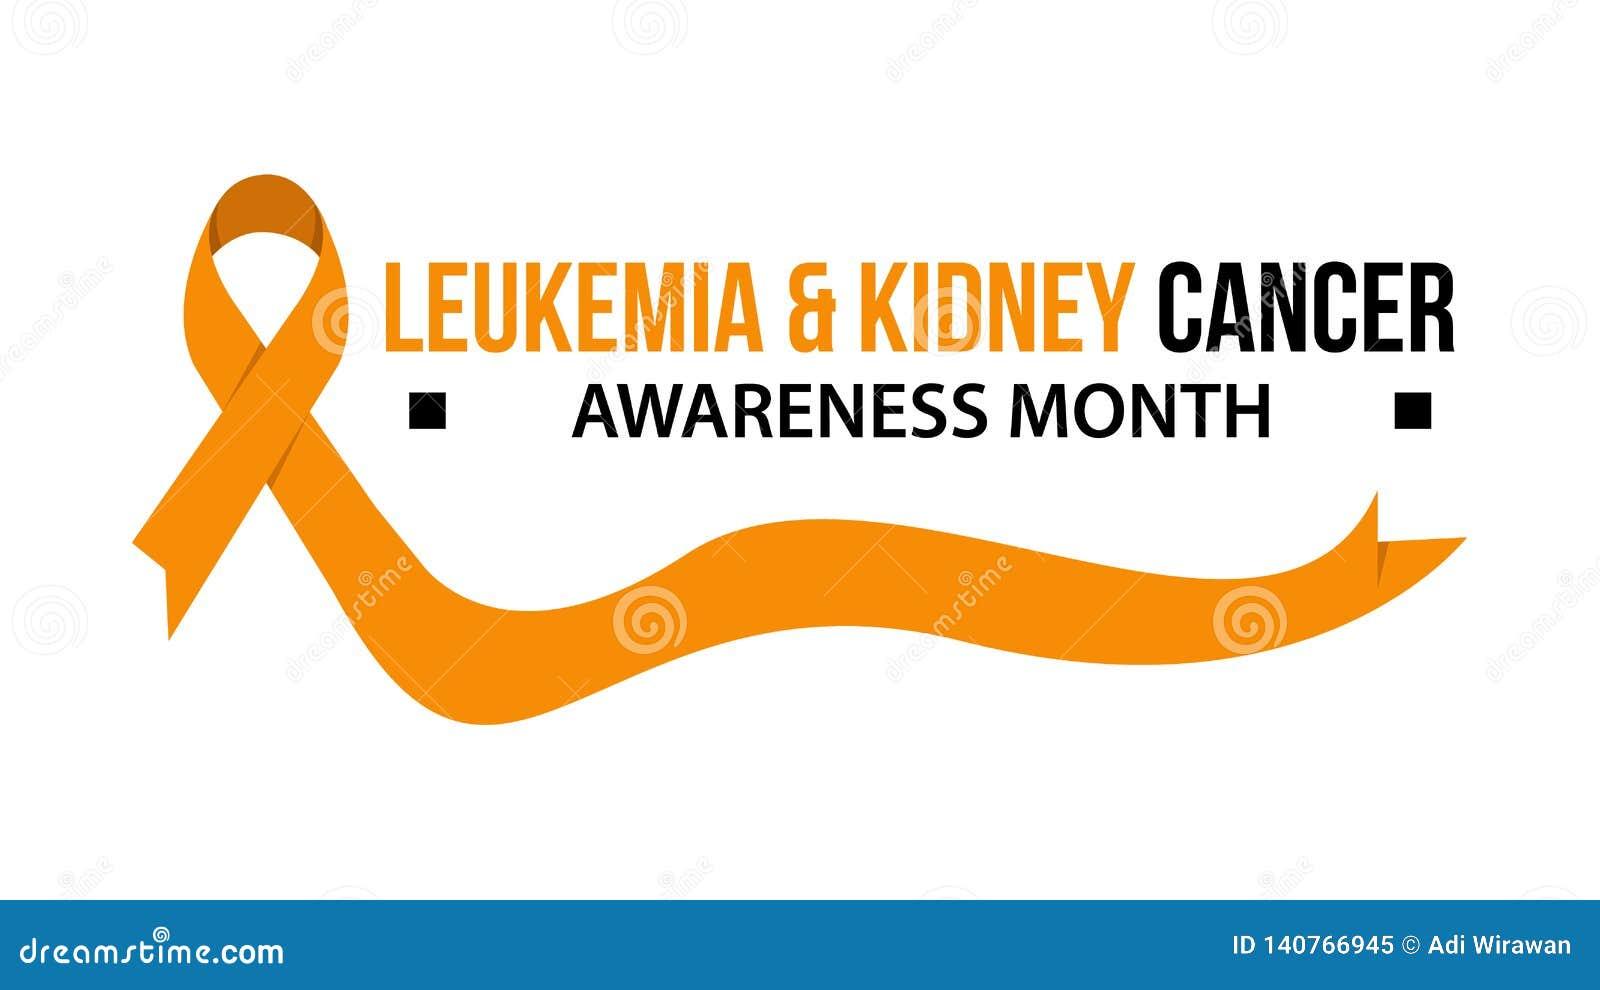 Leukemia Kidney Cancer Awareness Vector Illustration Stock Vector Illustration Of Lung Leukemia 140766945